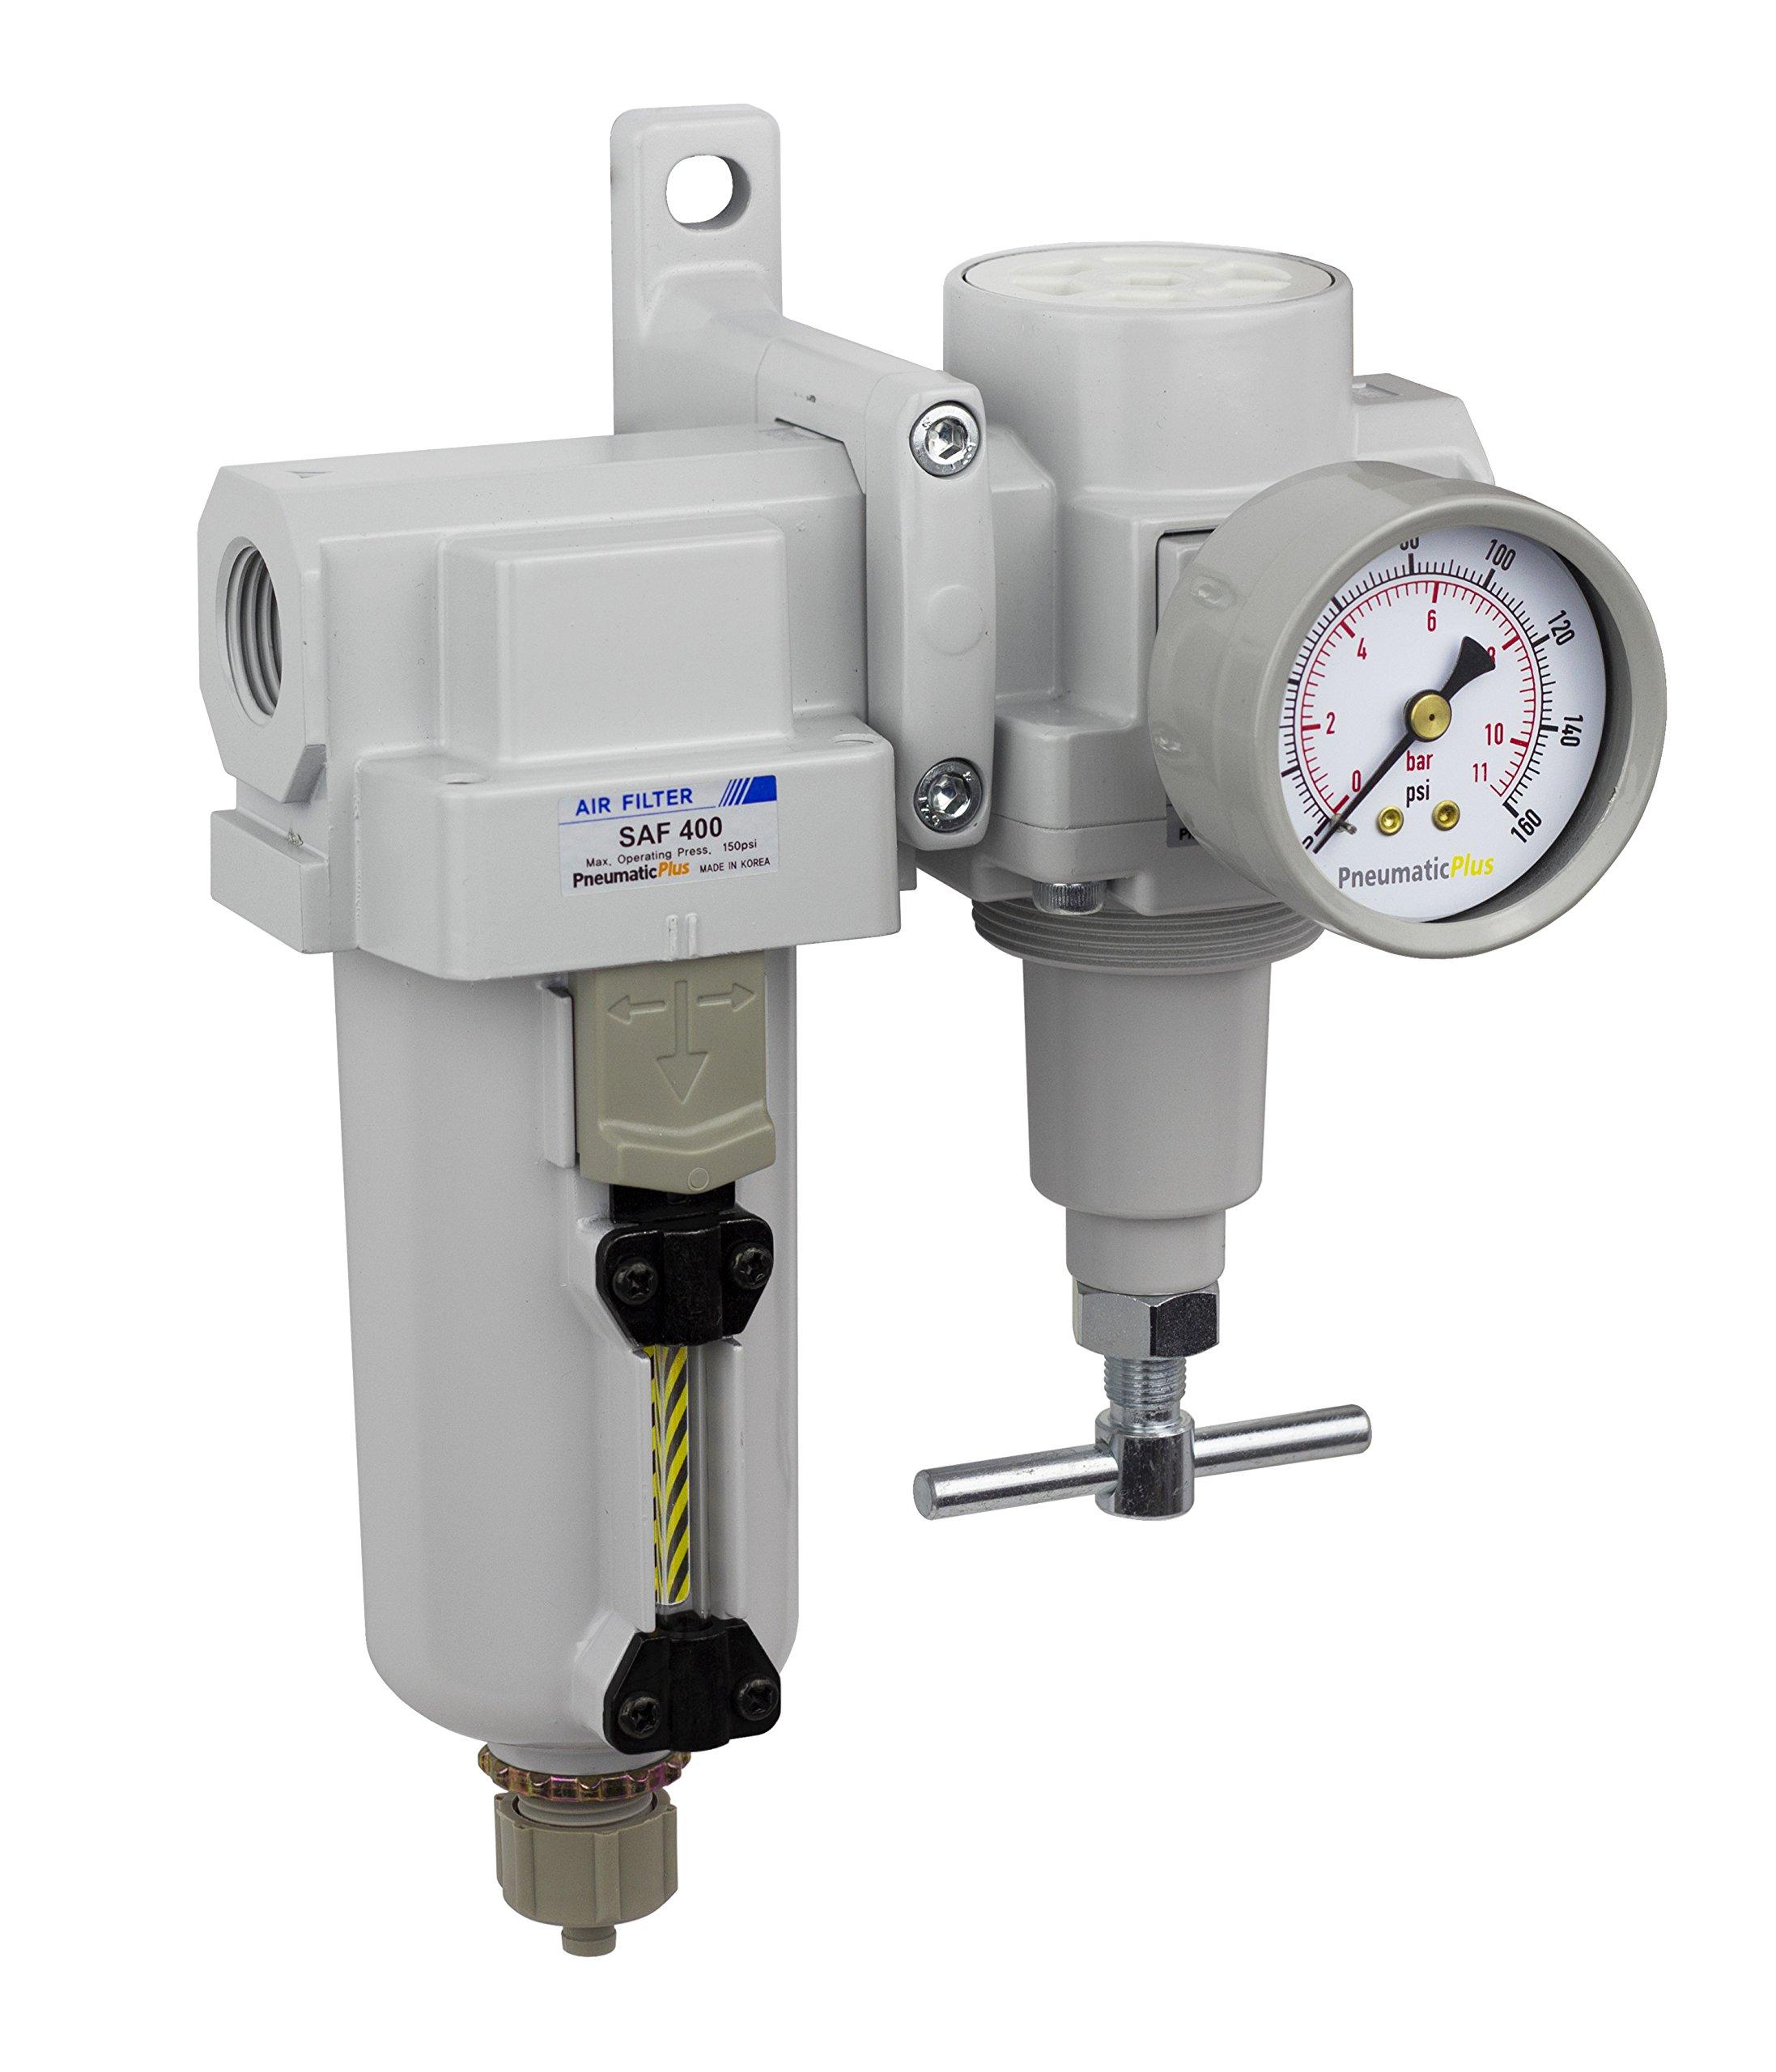 PneumaticPlus SAU420T-N04G-MEP Air Filter Regulator Combo 1/2'' NPT -T-Handle, Manual Drain, Metal Bowl by PneumaticPlus